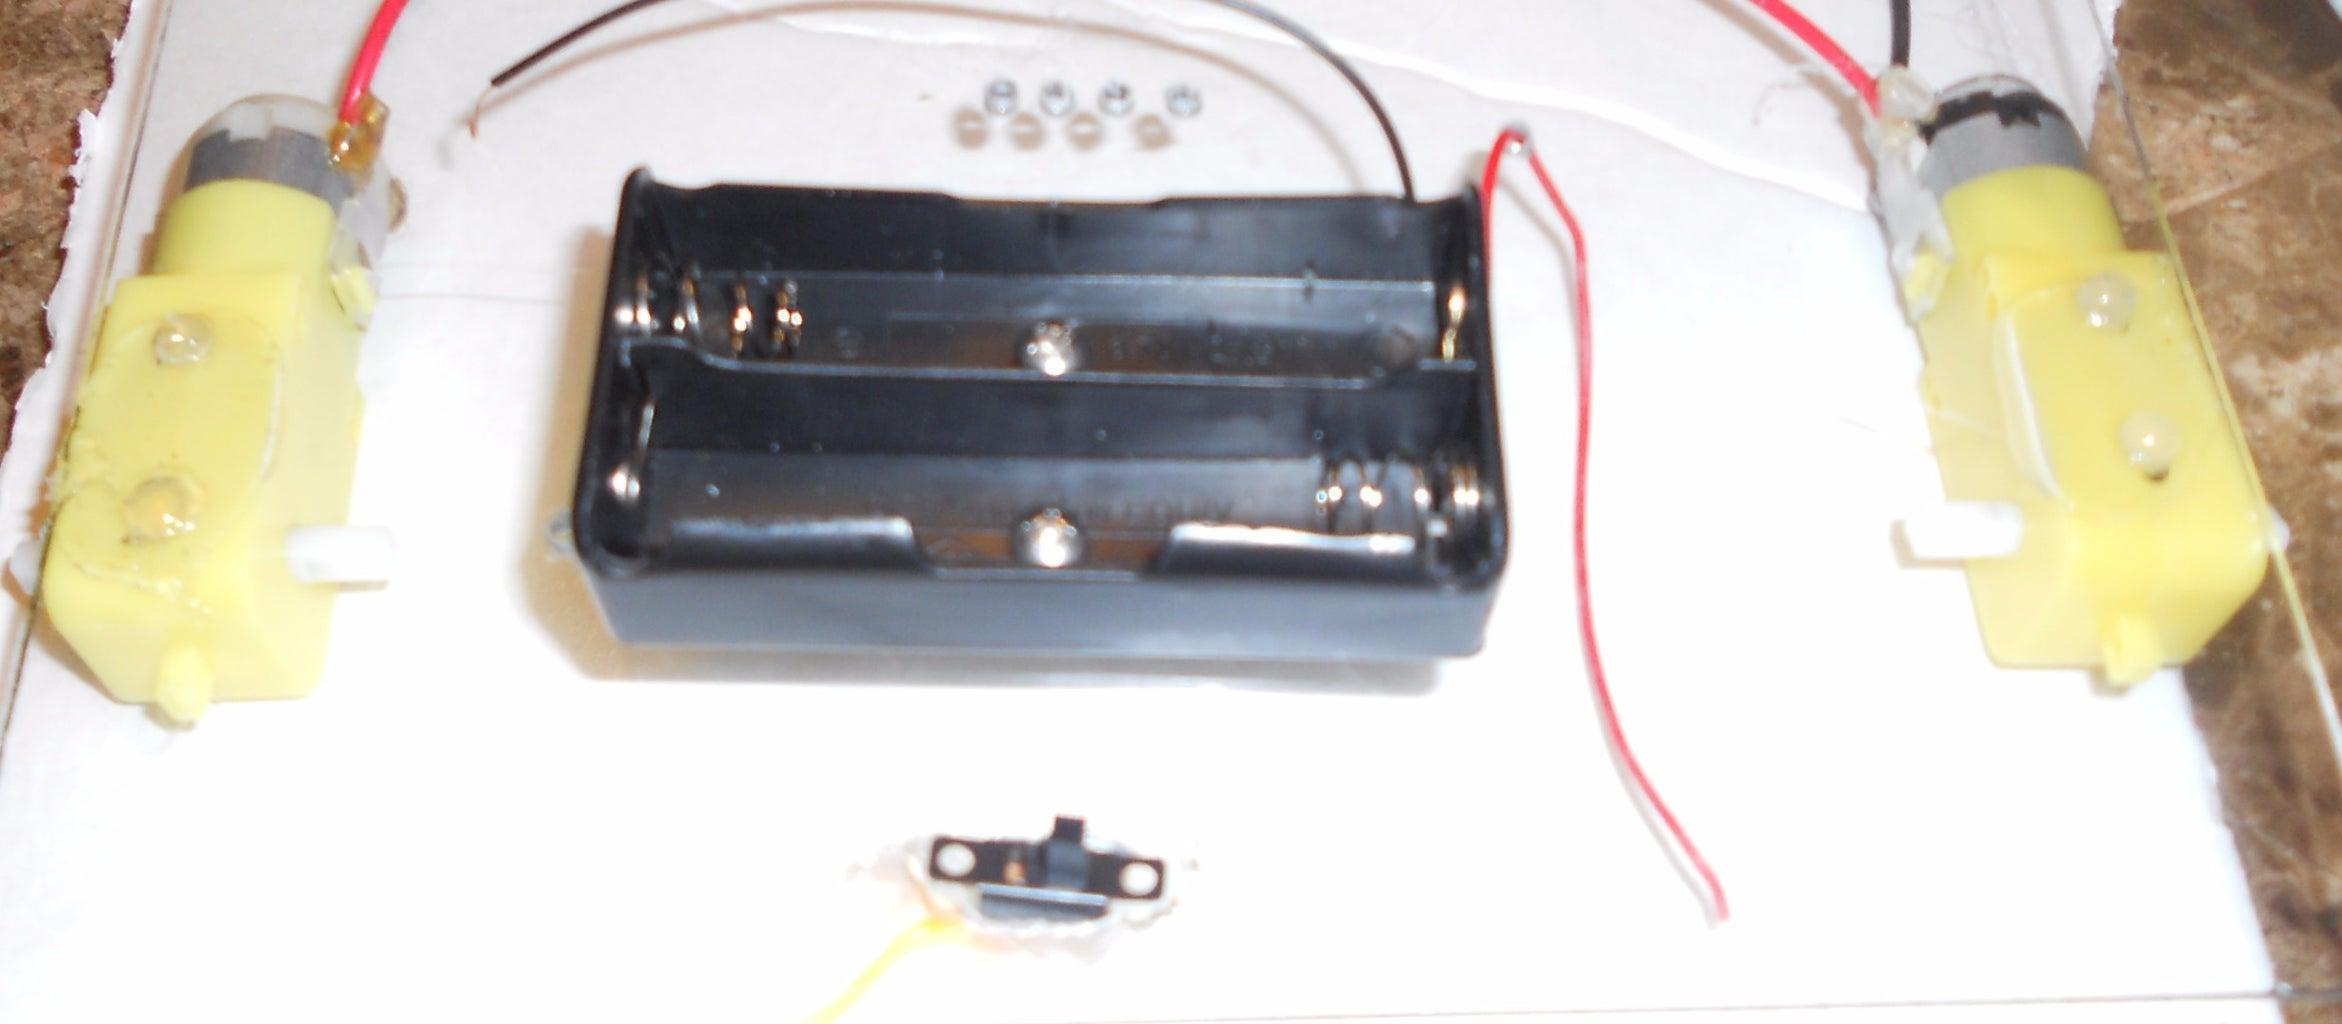 Screw in the Battery Holder